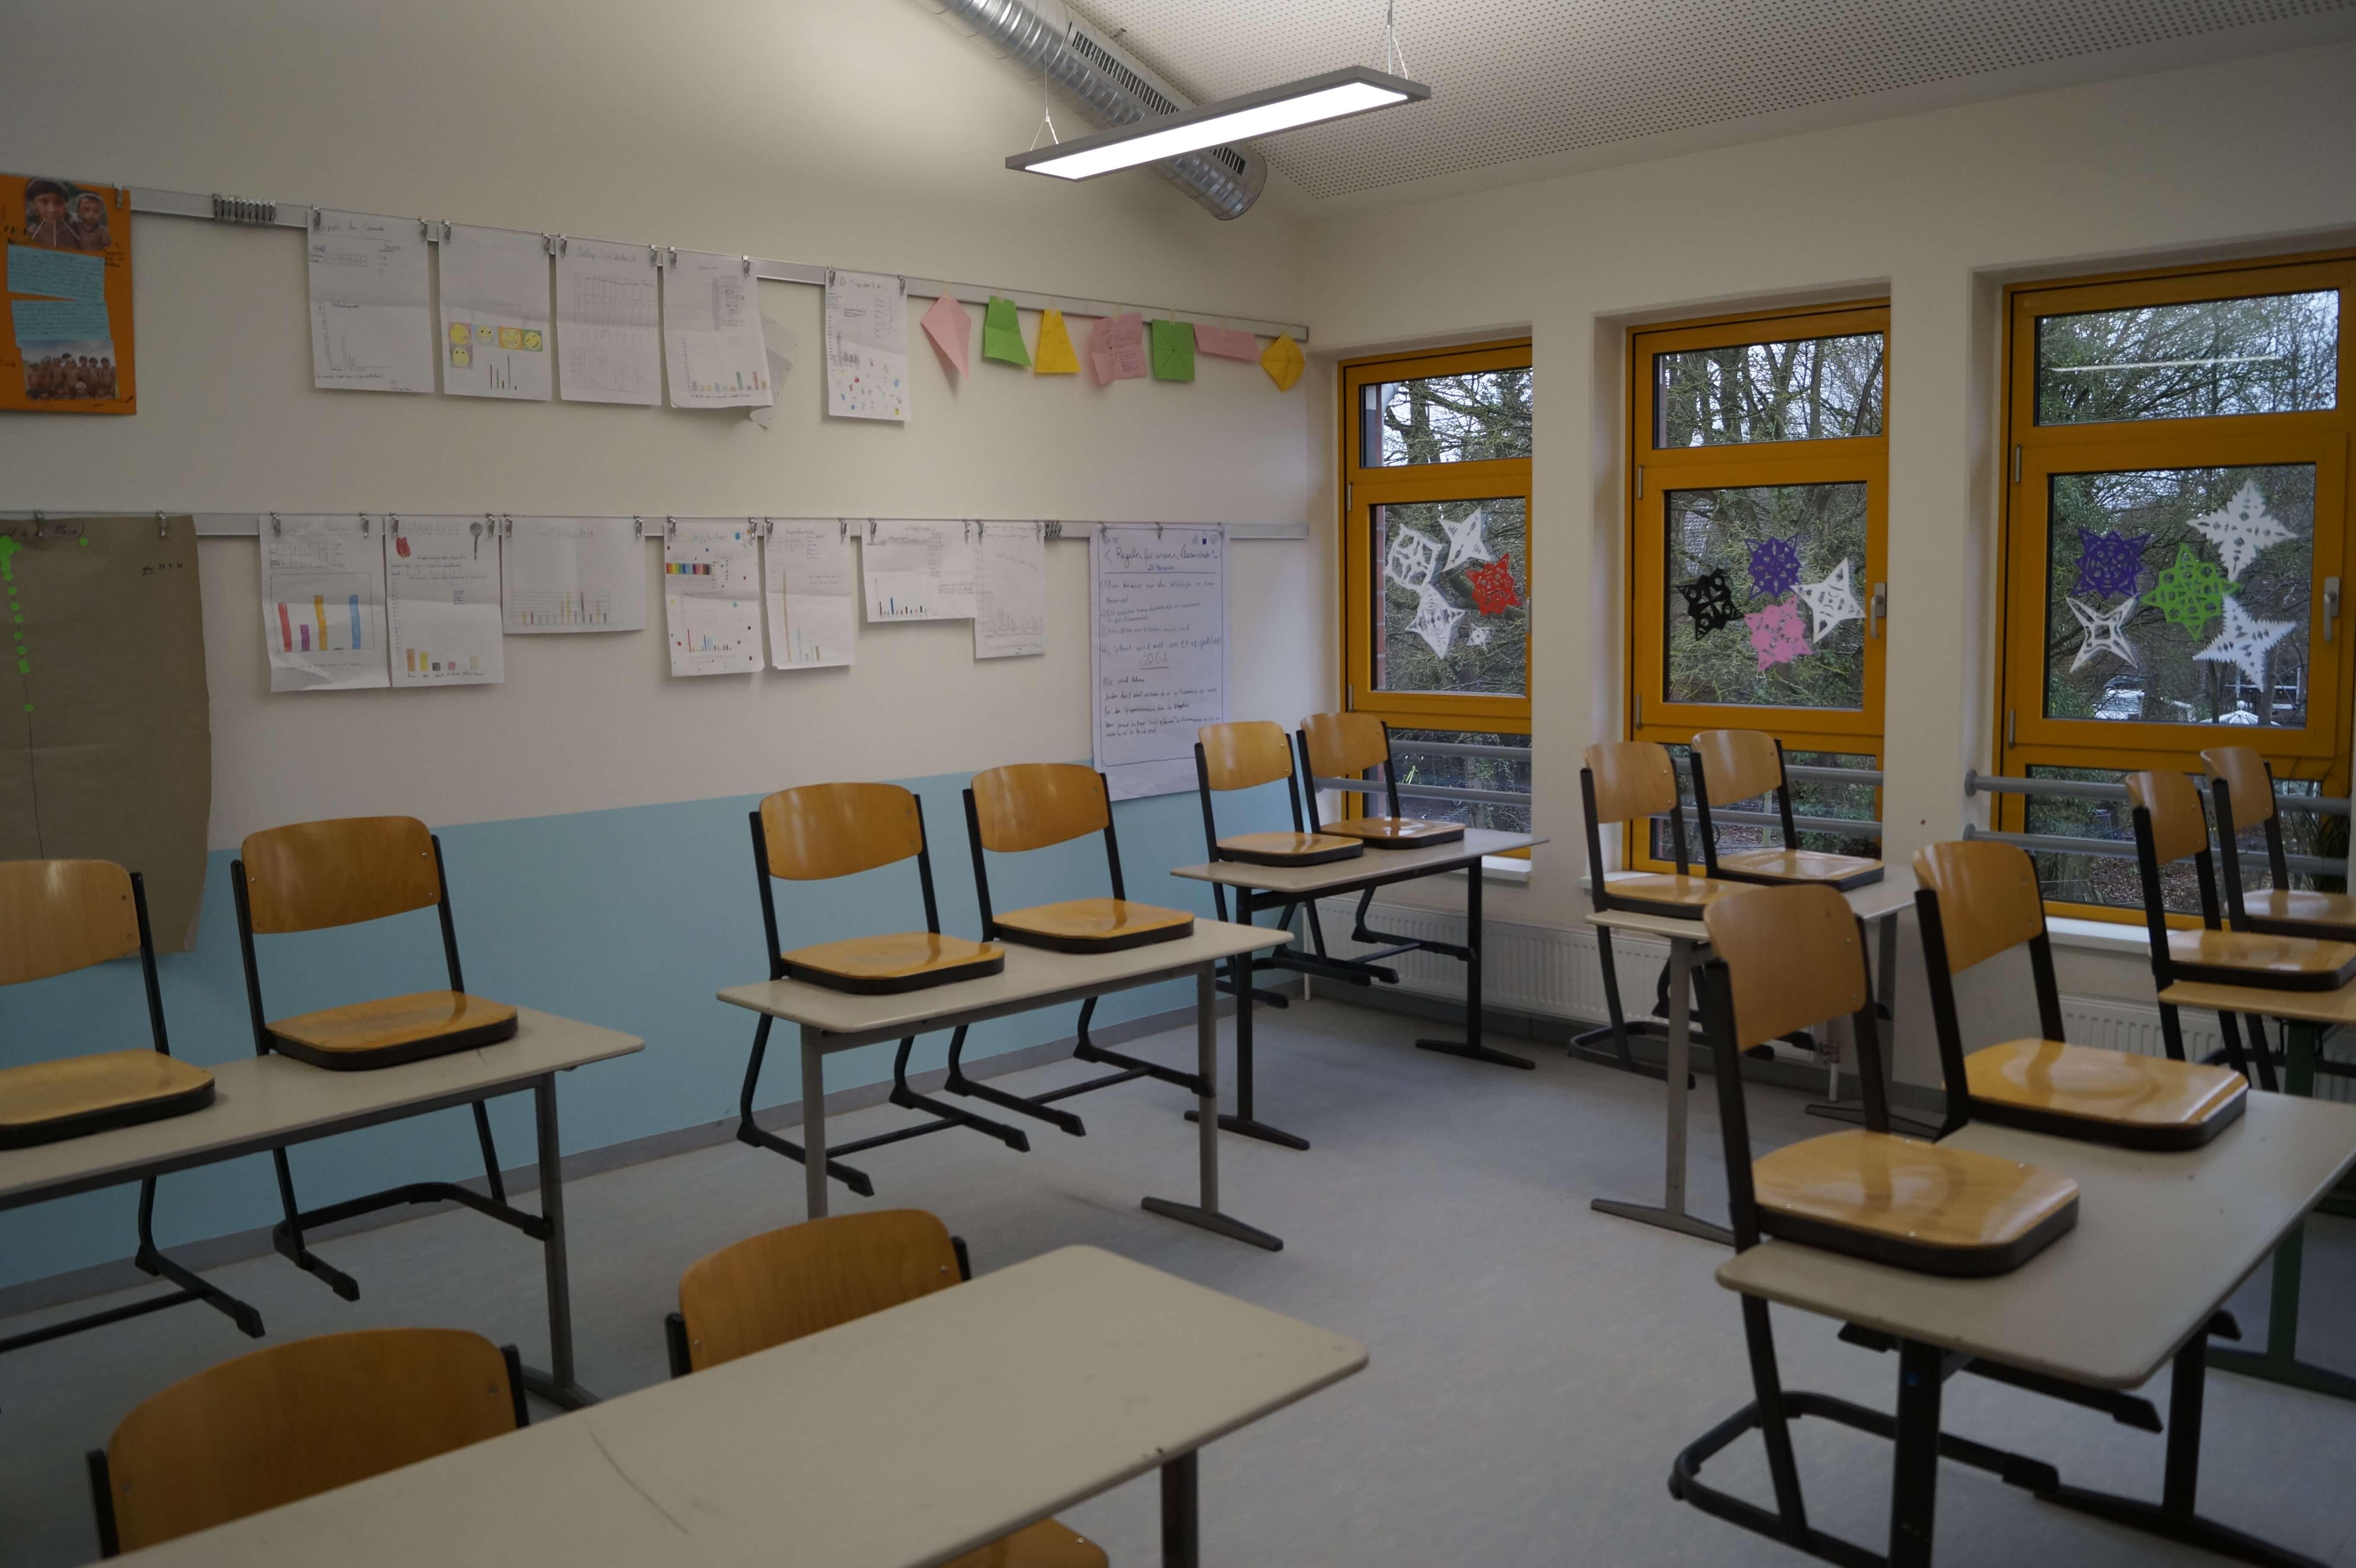 Klassenraum__1_.JPG